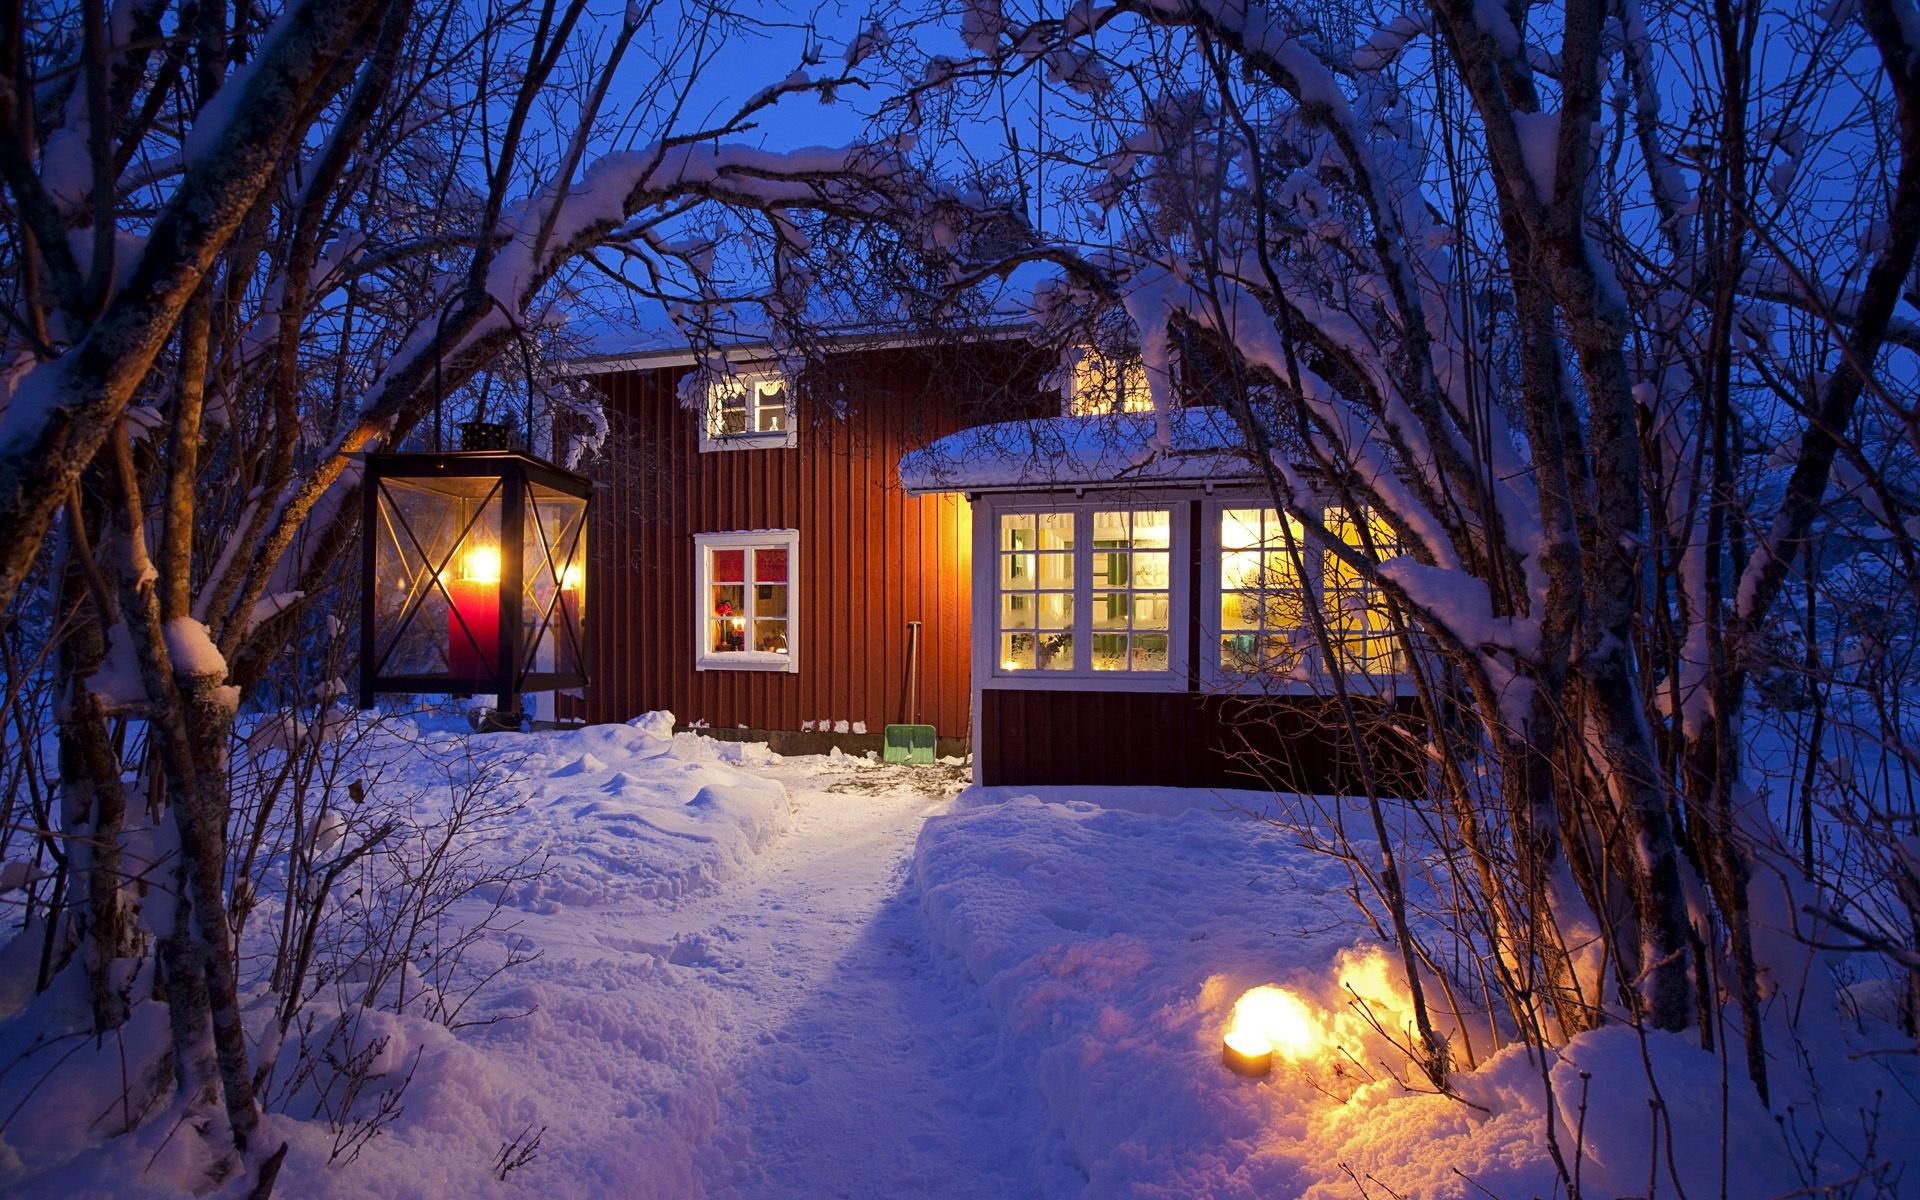 Windows 8 Theme Hd Wallpapers Winter Snow Night 9